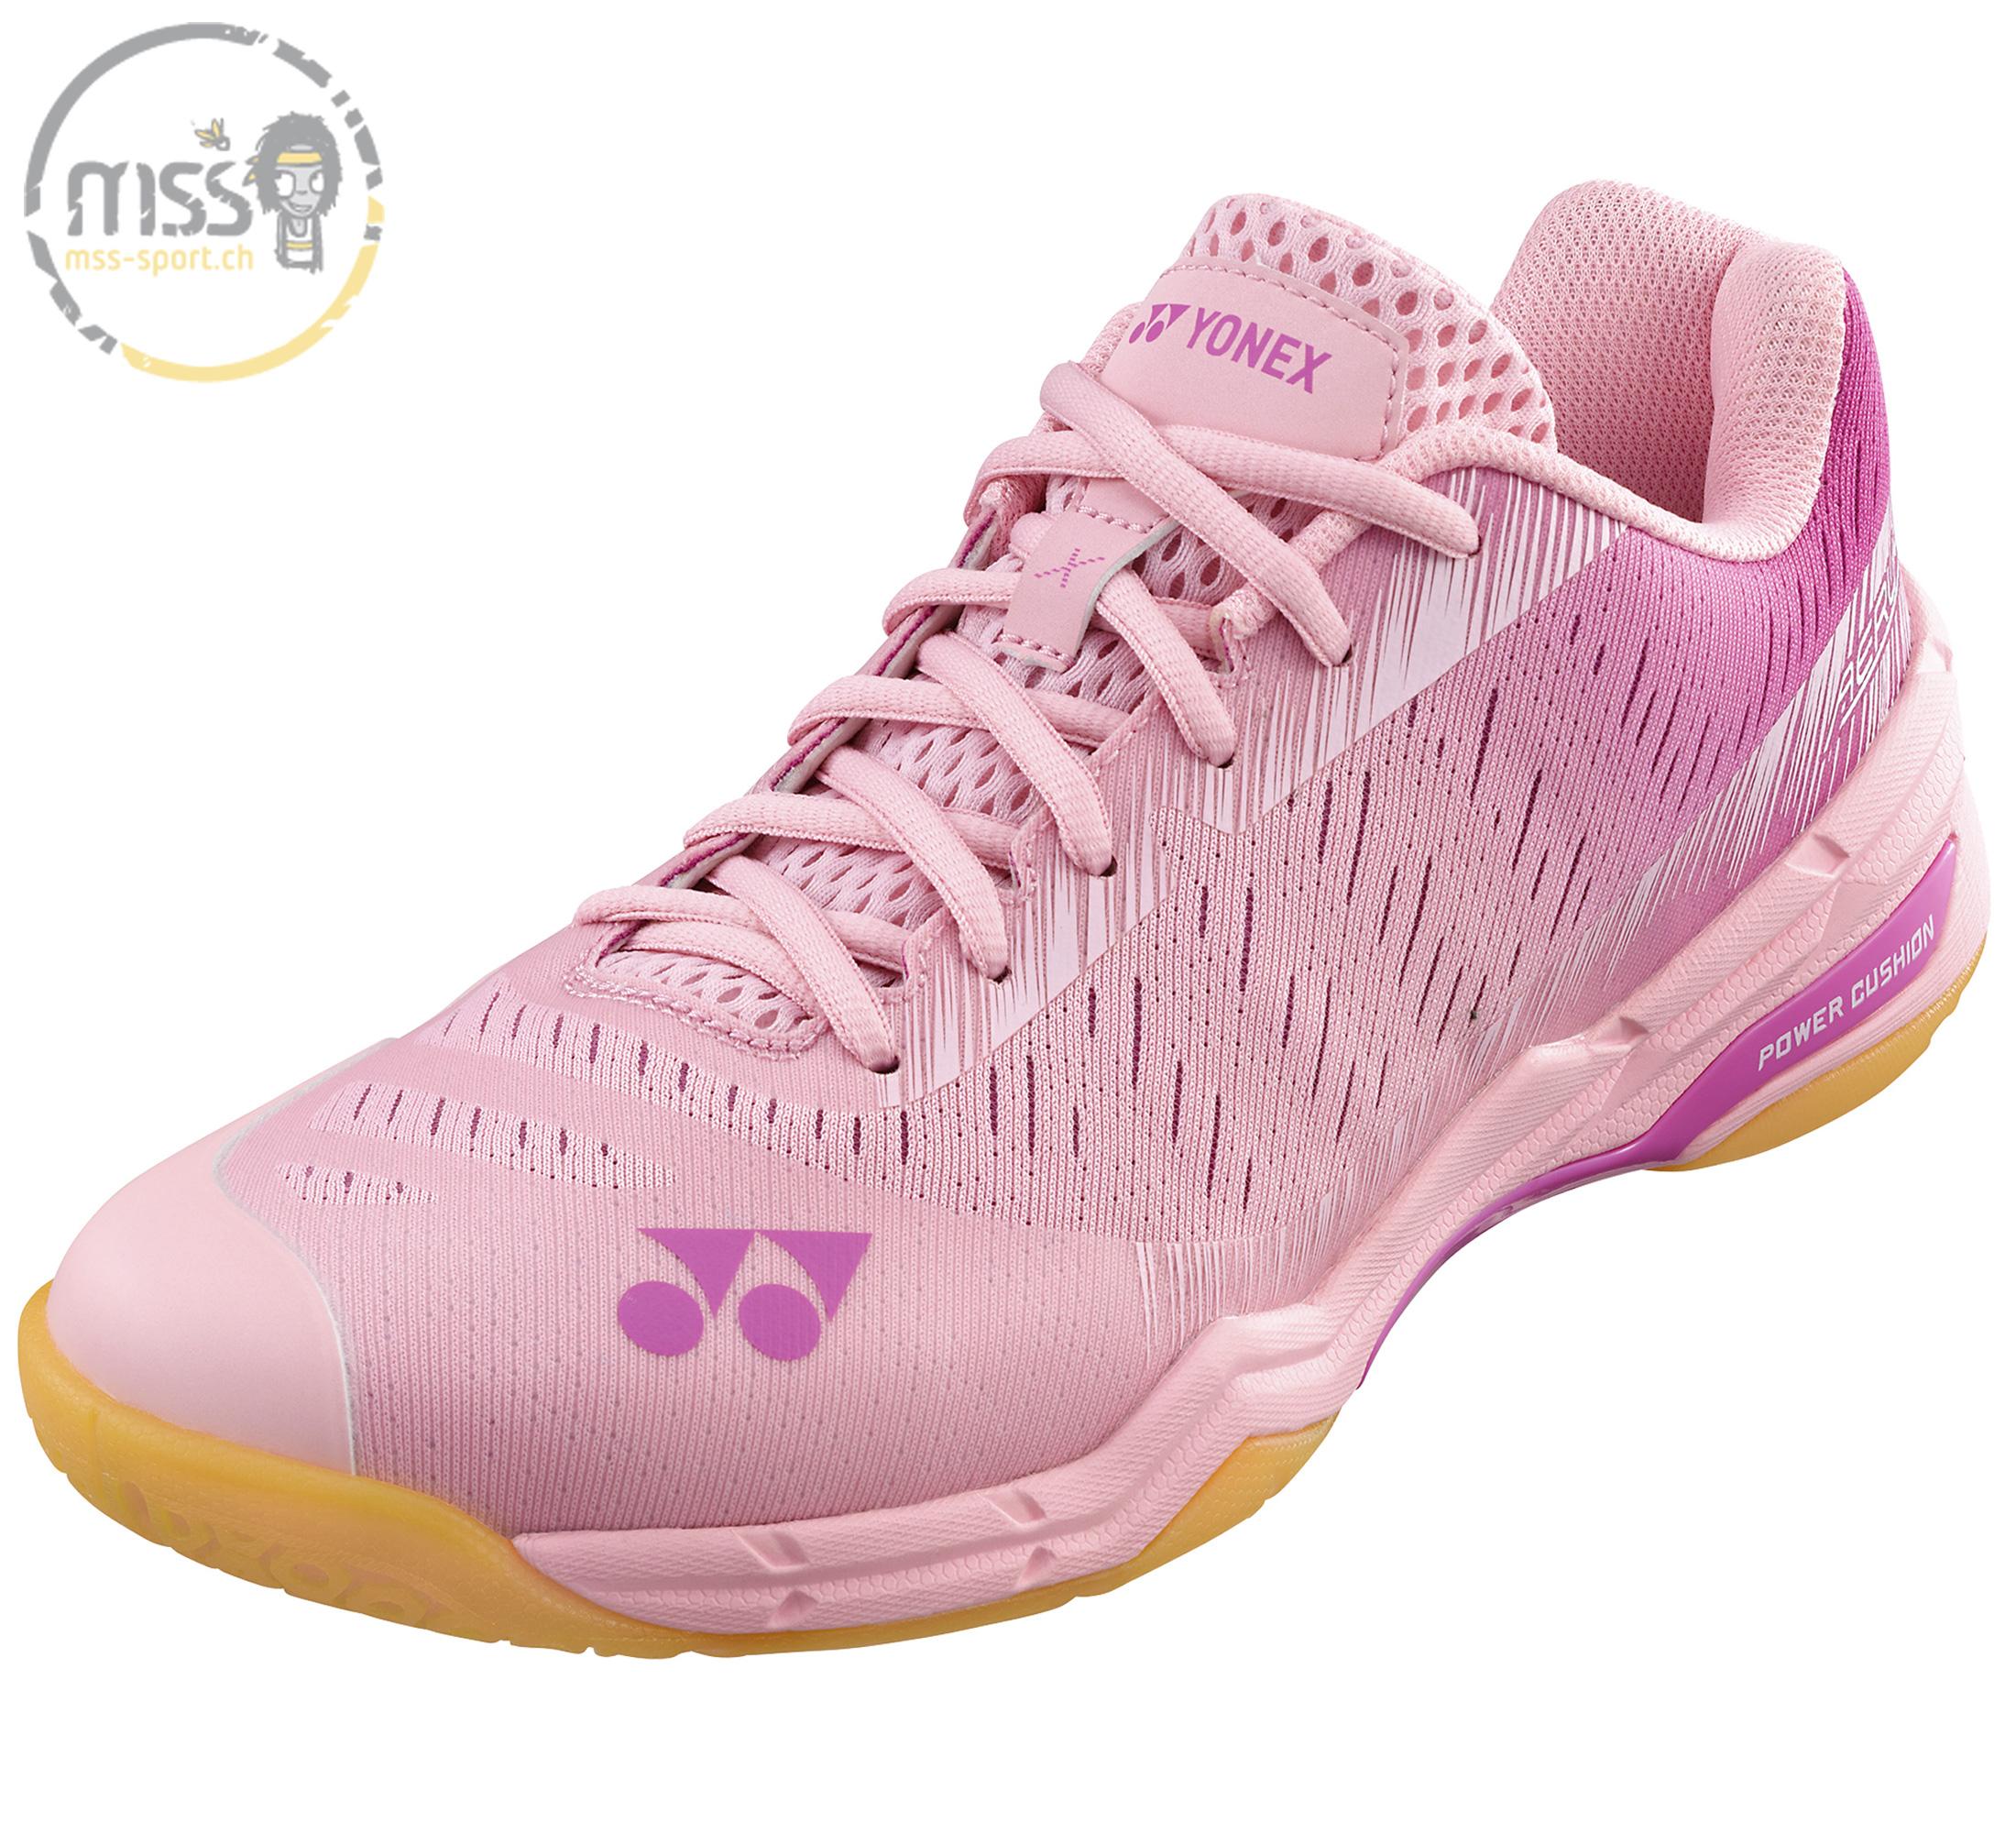 Yonex Aerus X pastel pink